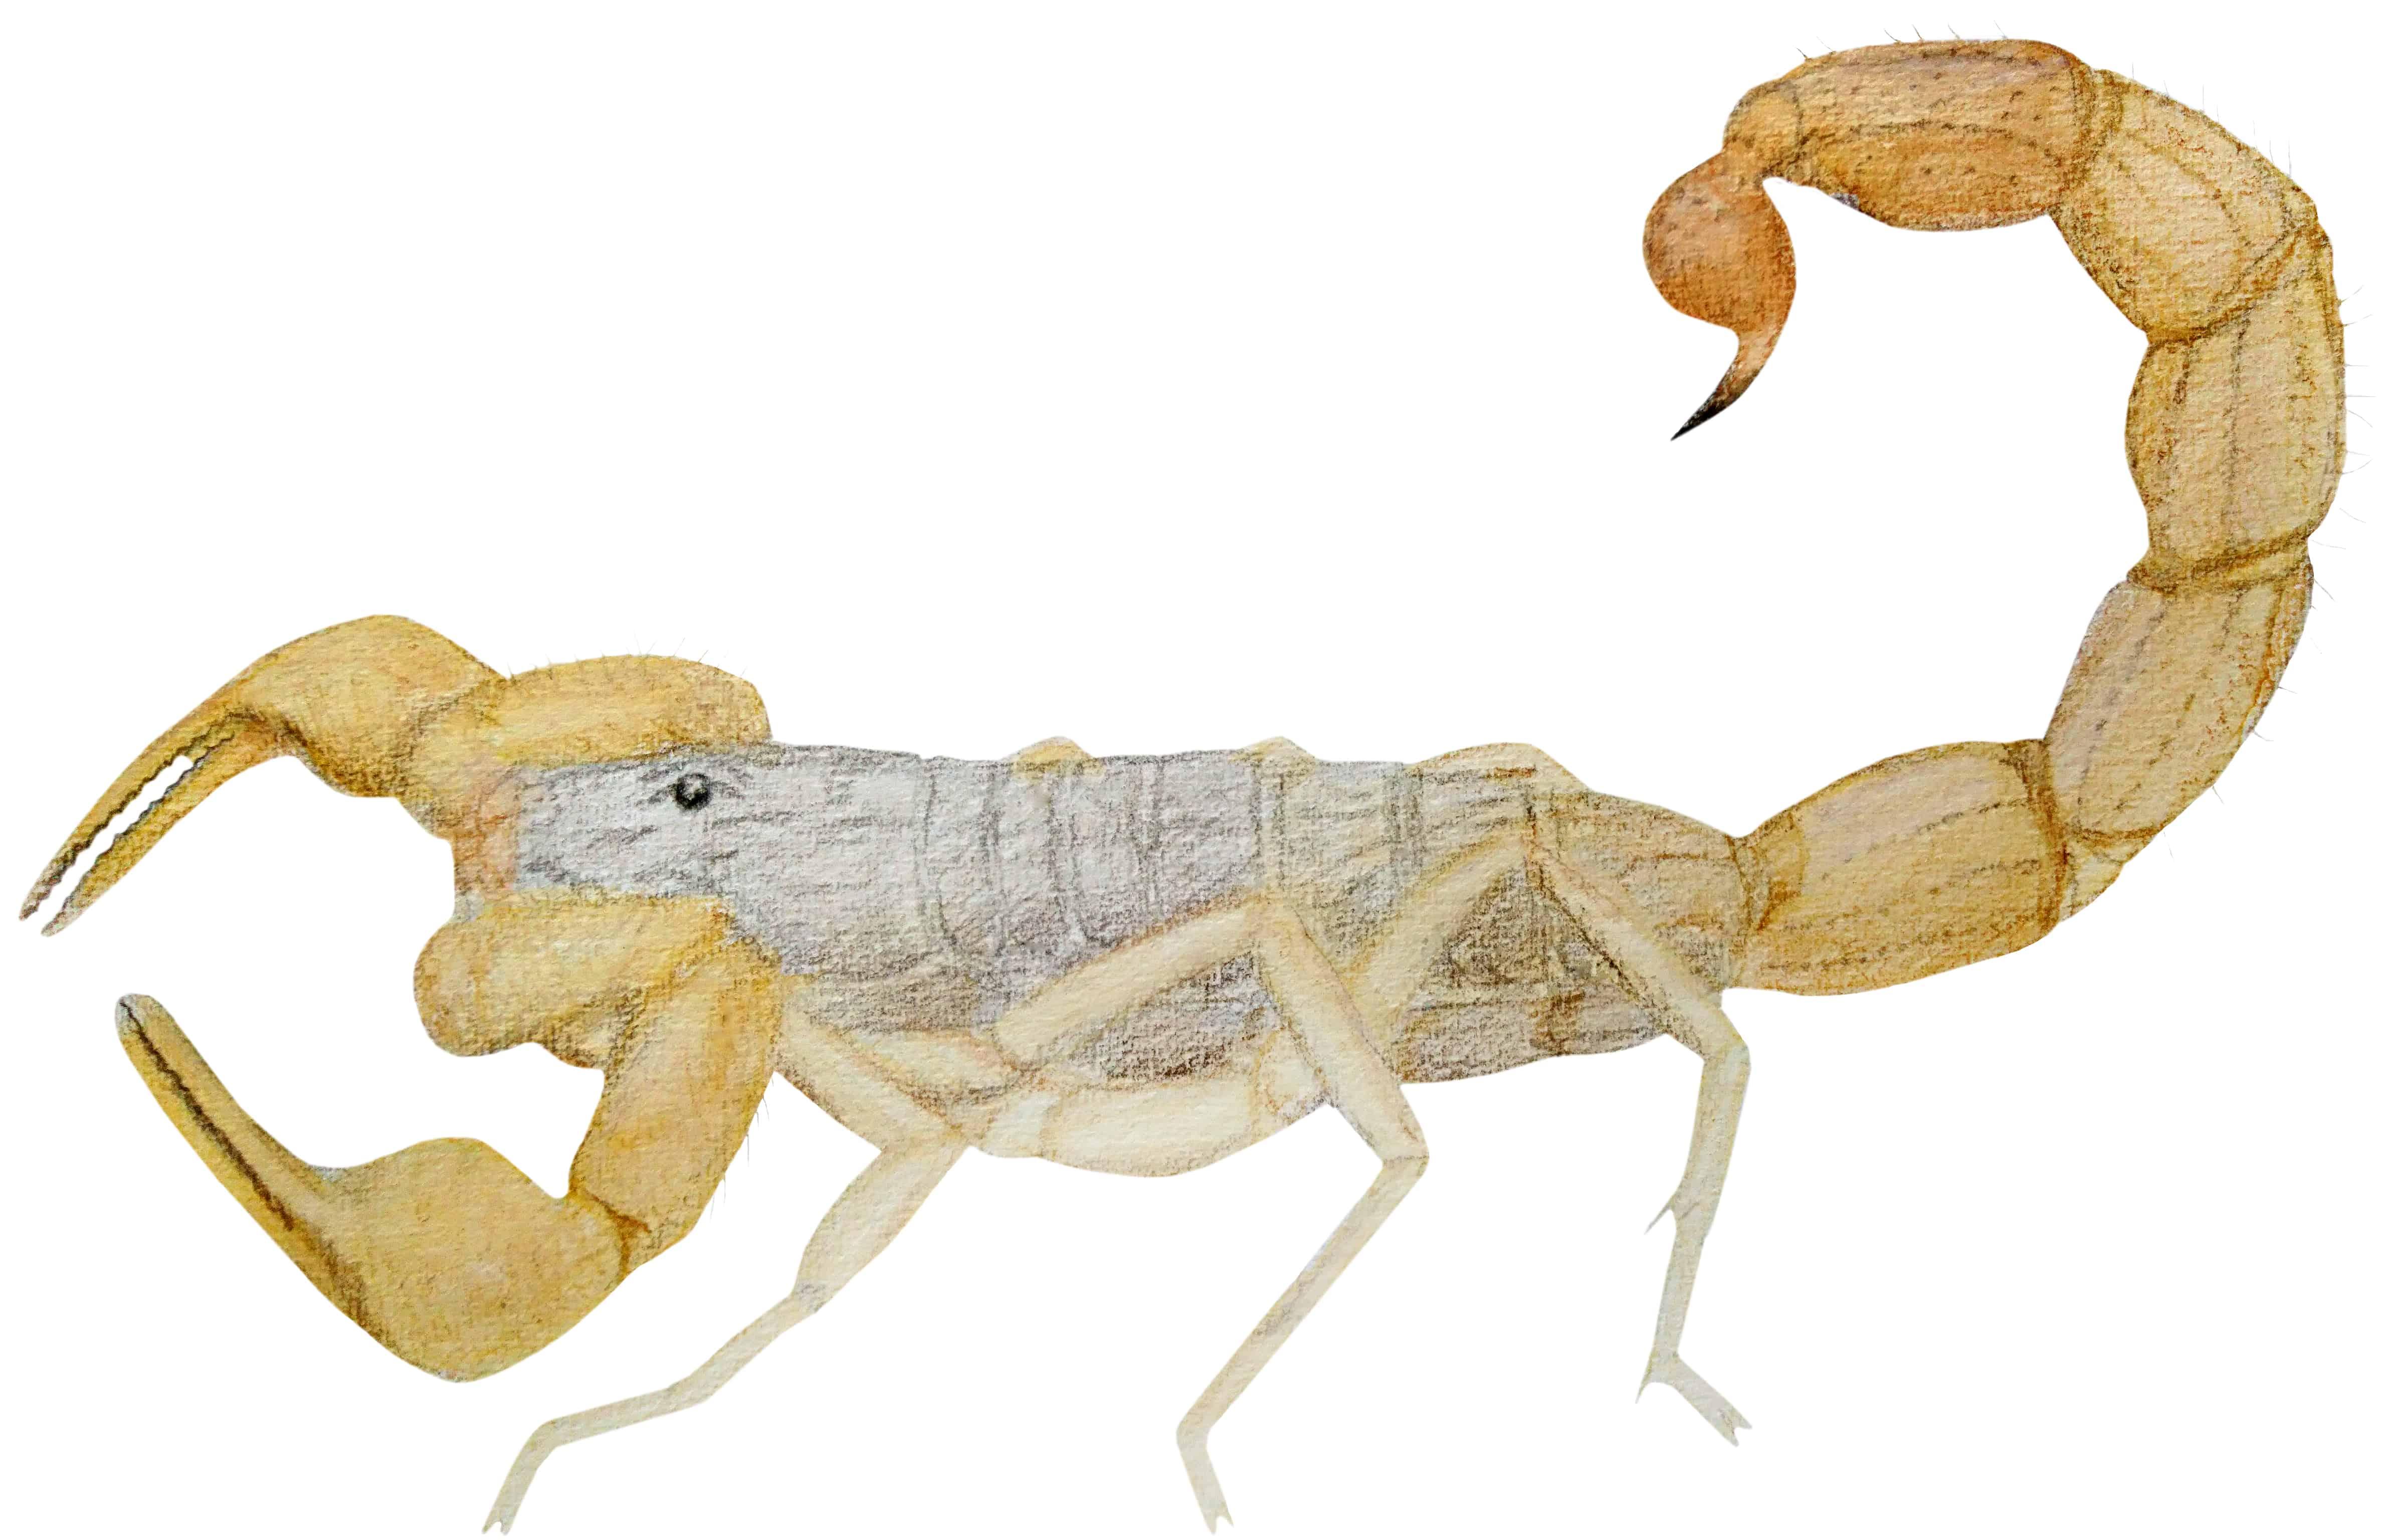 Scorpio - The Western Zodiac